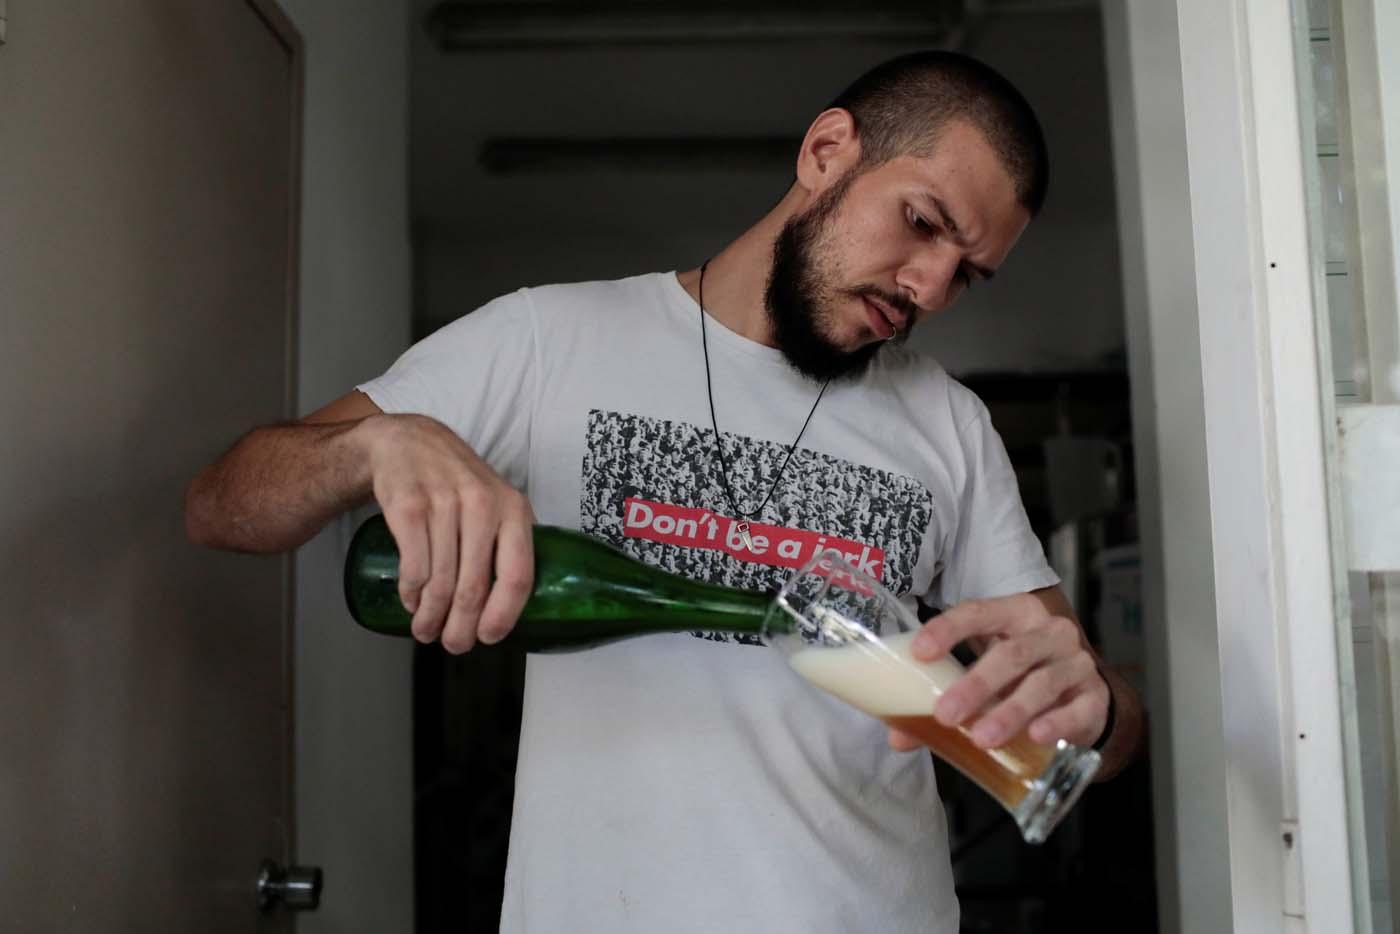 Francisco Lopez serves craft beer at Cerveza Caleta brewery in Caracas, Venezuela, September 13, 2017. Picture taken September 13, 2017. REUTERS/Marco Bello